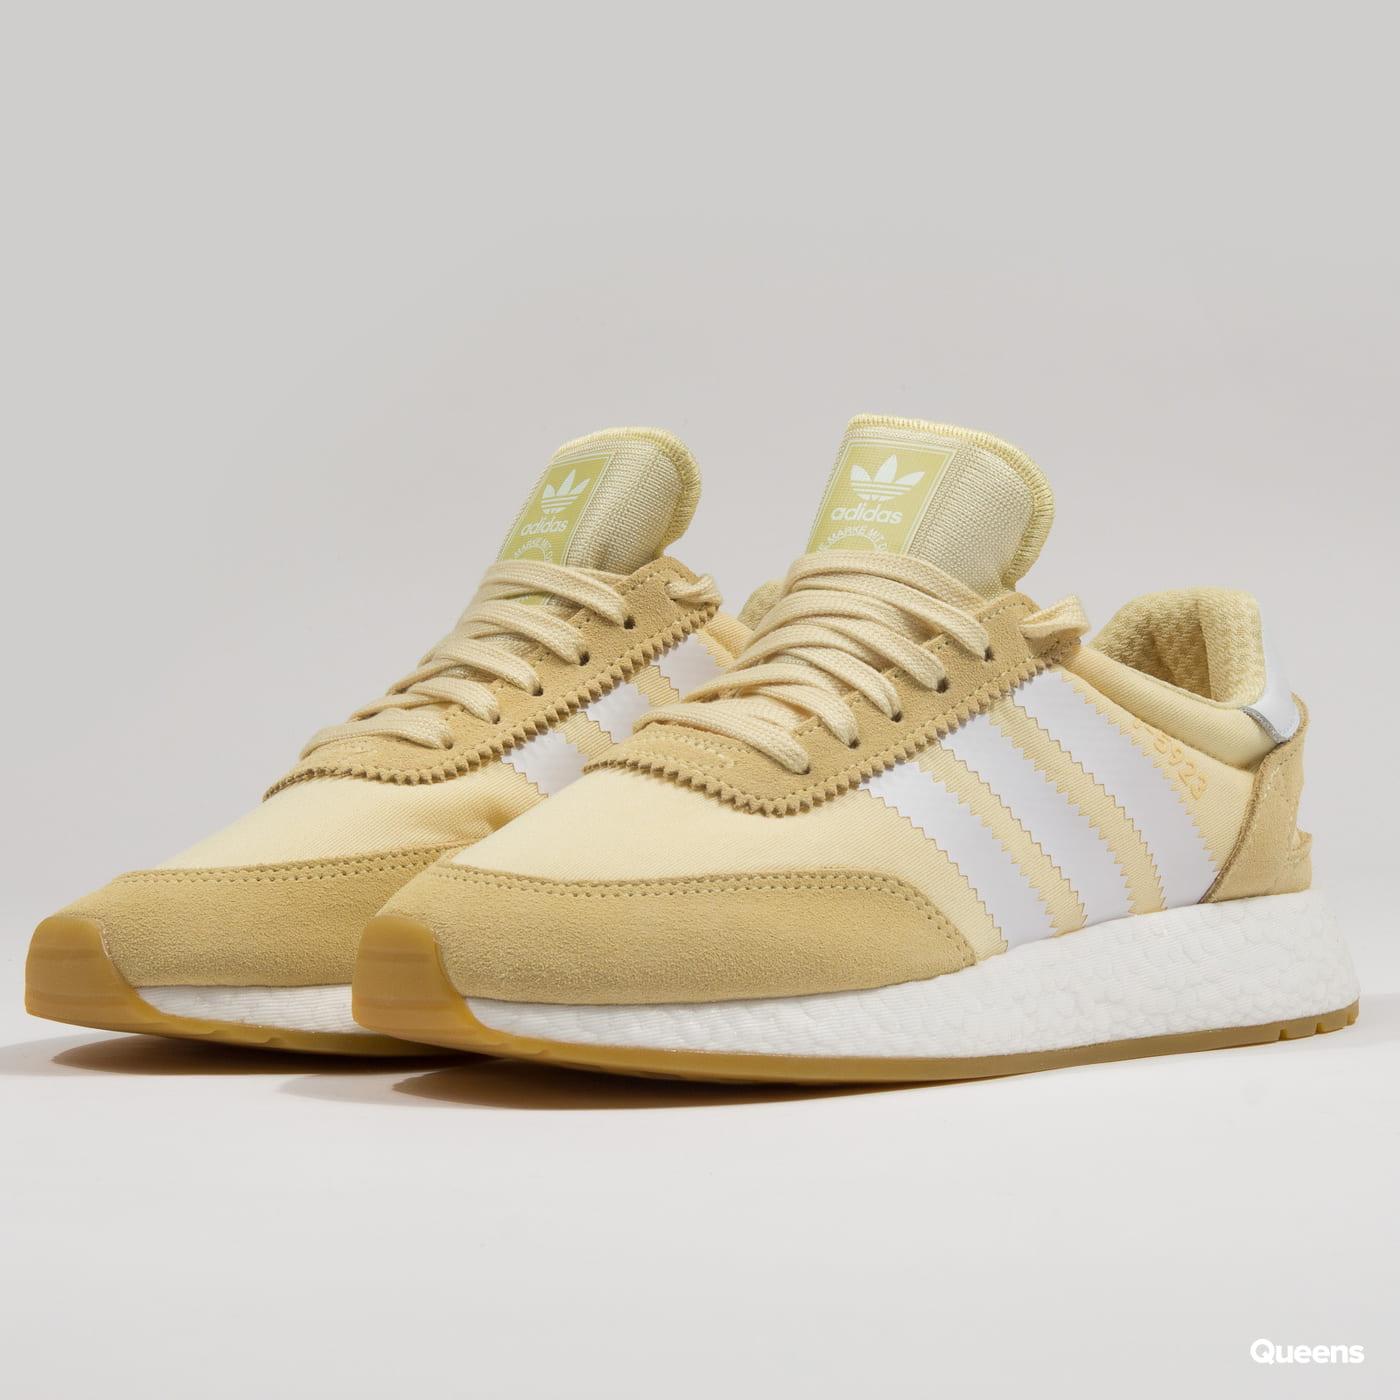 Adidas Originals I 5923 W (B37972)– Queens  Queensland